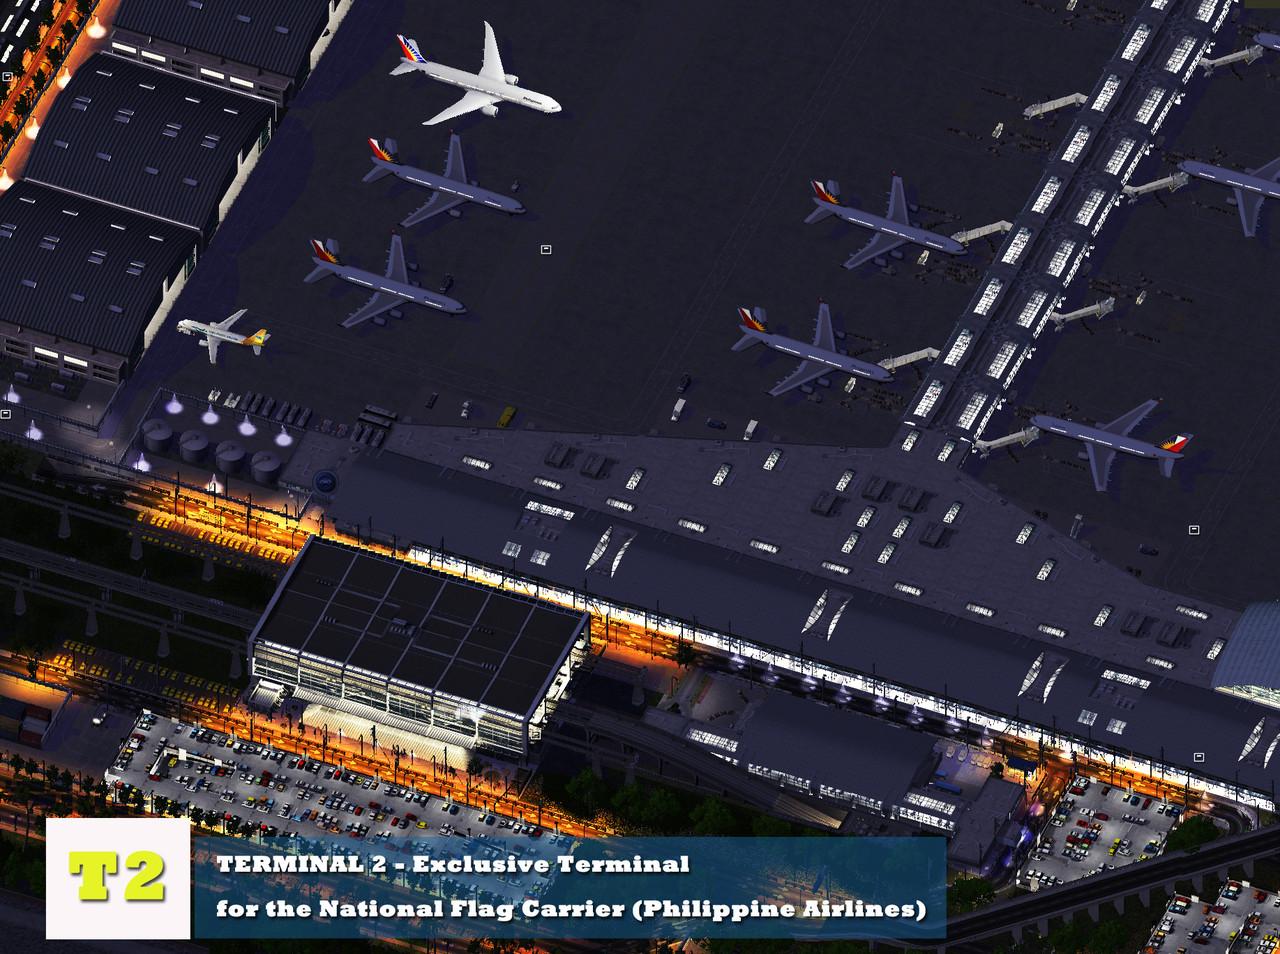 5b58018aafb23_Terminal2.thumb.jpg.c20c7d2b92b067849476fa182c23c305.jpg